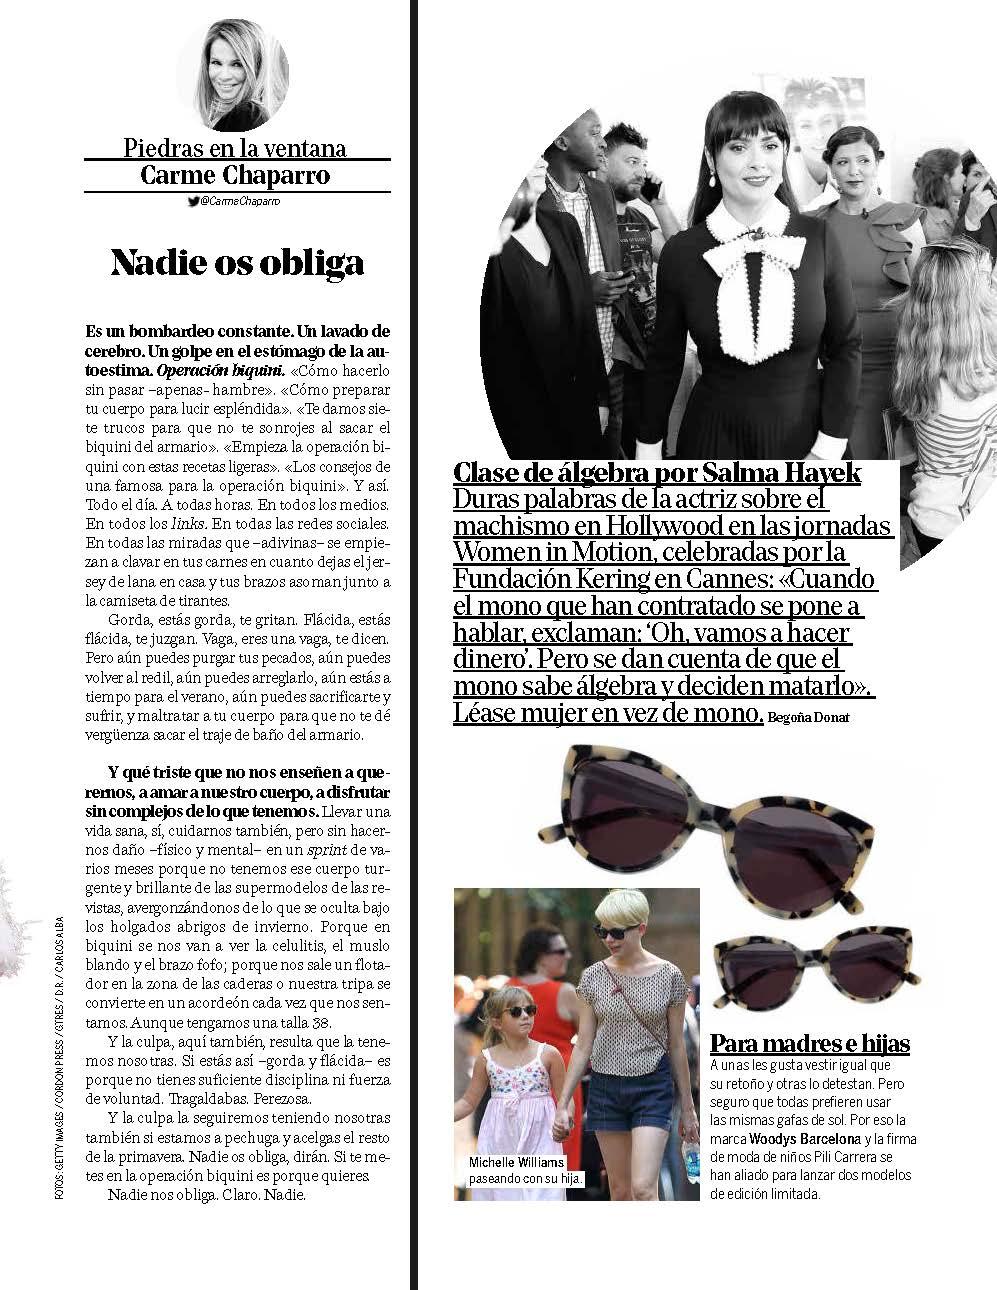 https://whiterabbit.es/wp-content/uploads/2017/06/Revista_Yo-Dona-1.jpg